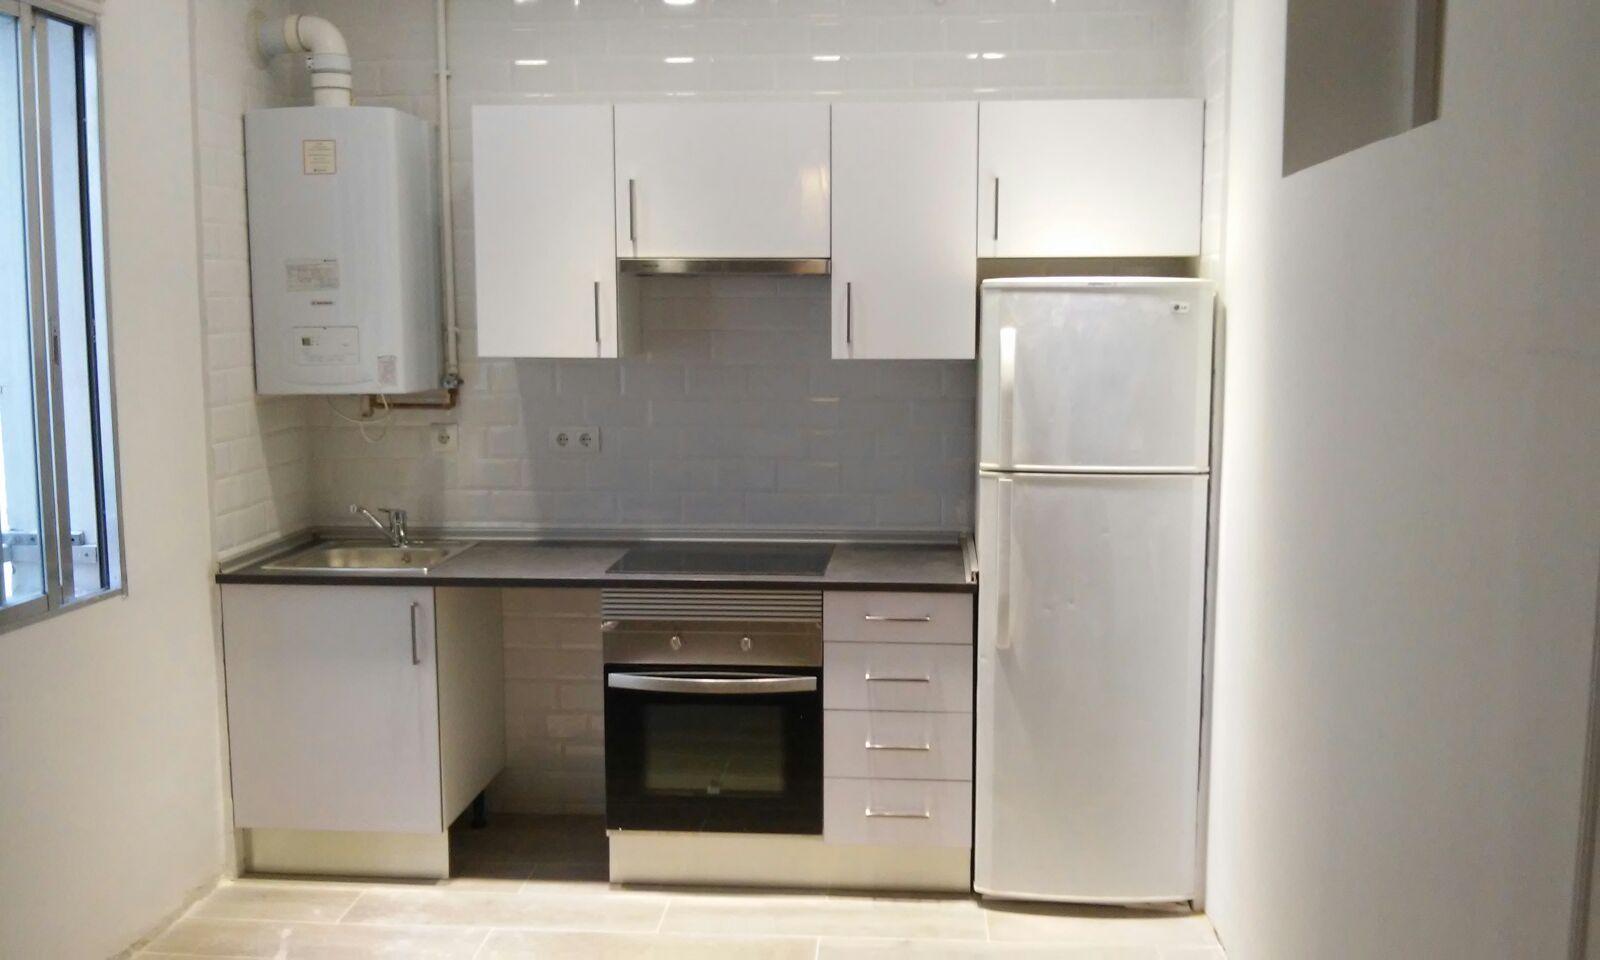 Montadores de muebles de cocina - Montadores de muebles autonomos ...